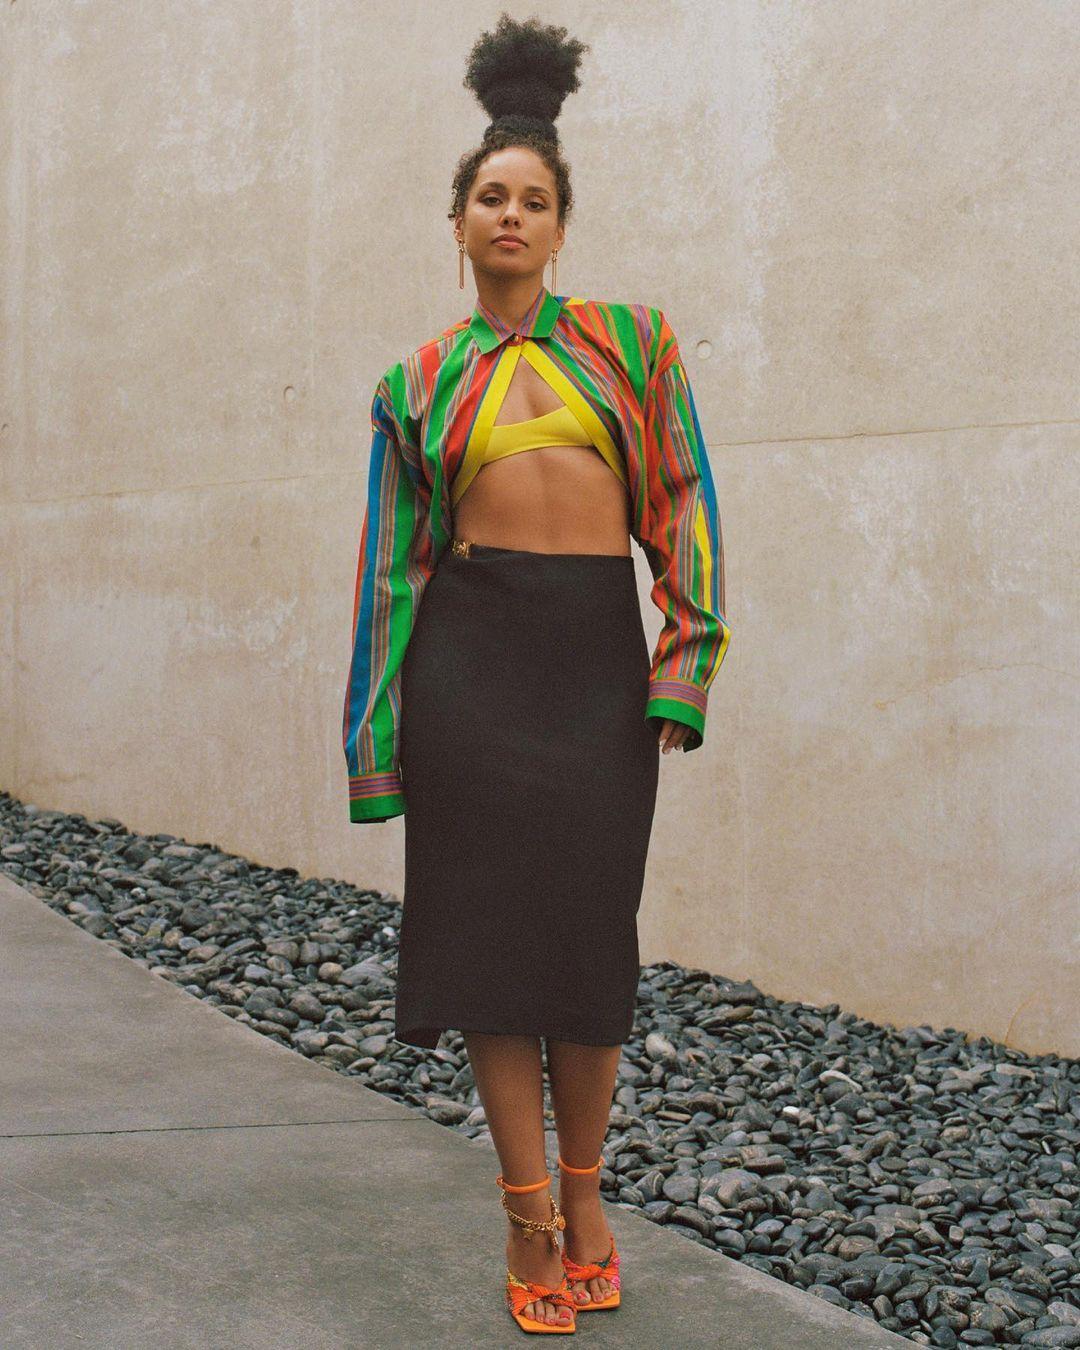 Alicia Keys Balenciaga Top Versace skirt no makeup makeup look black-celebs-style-stars-instagram